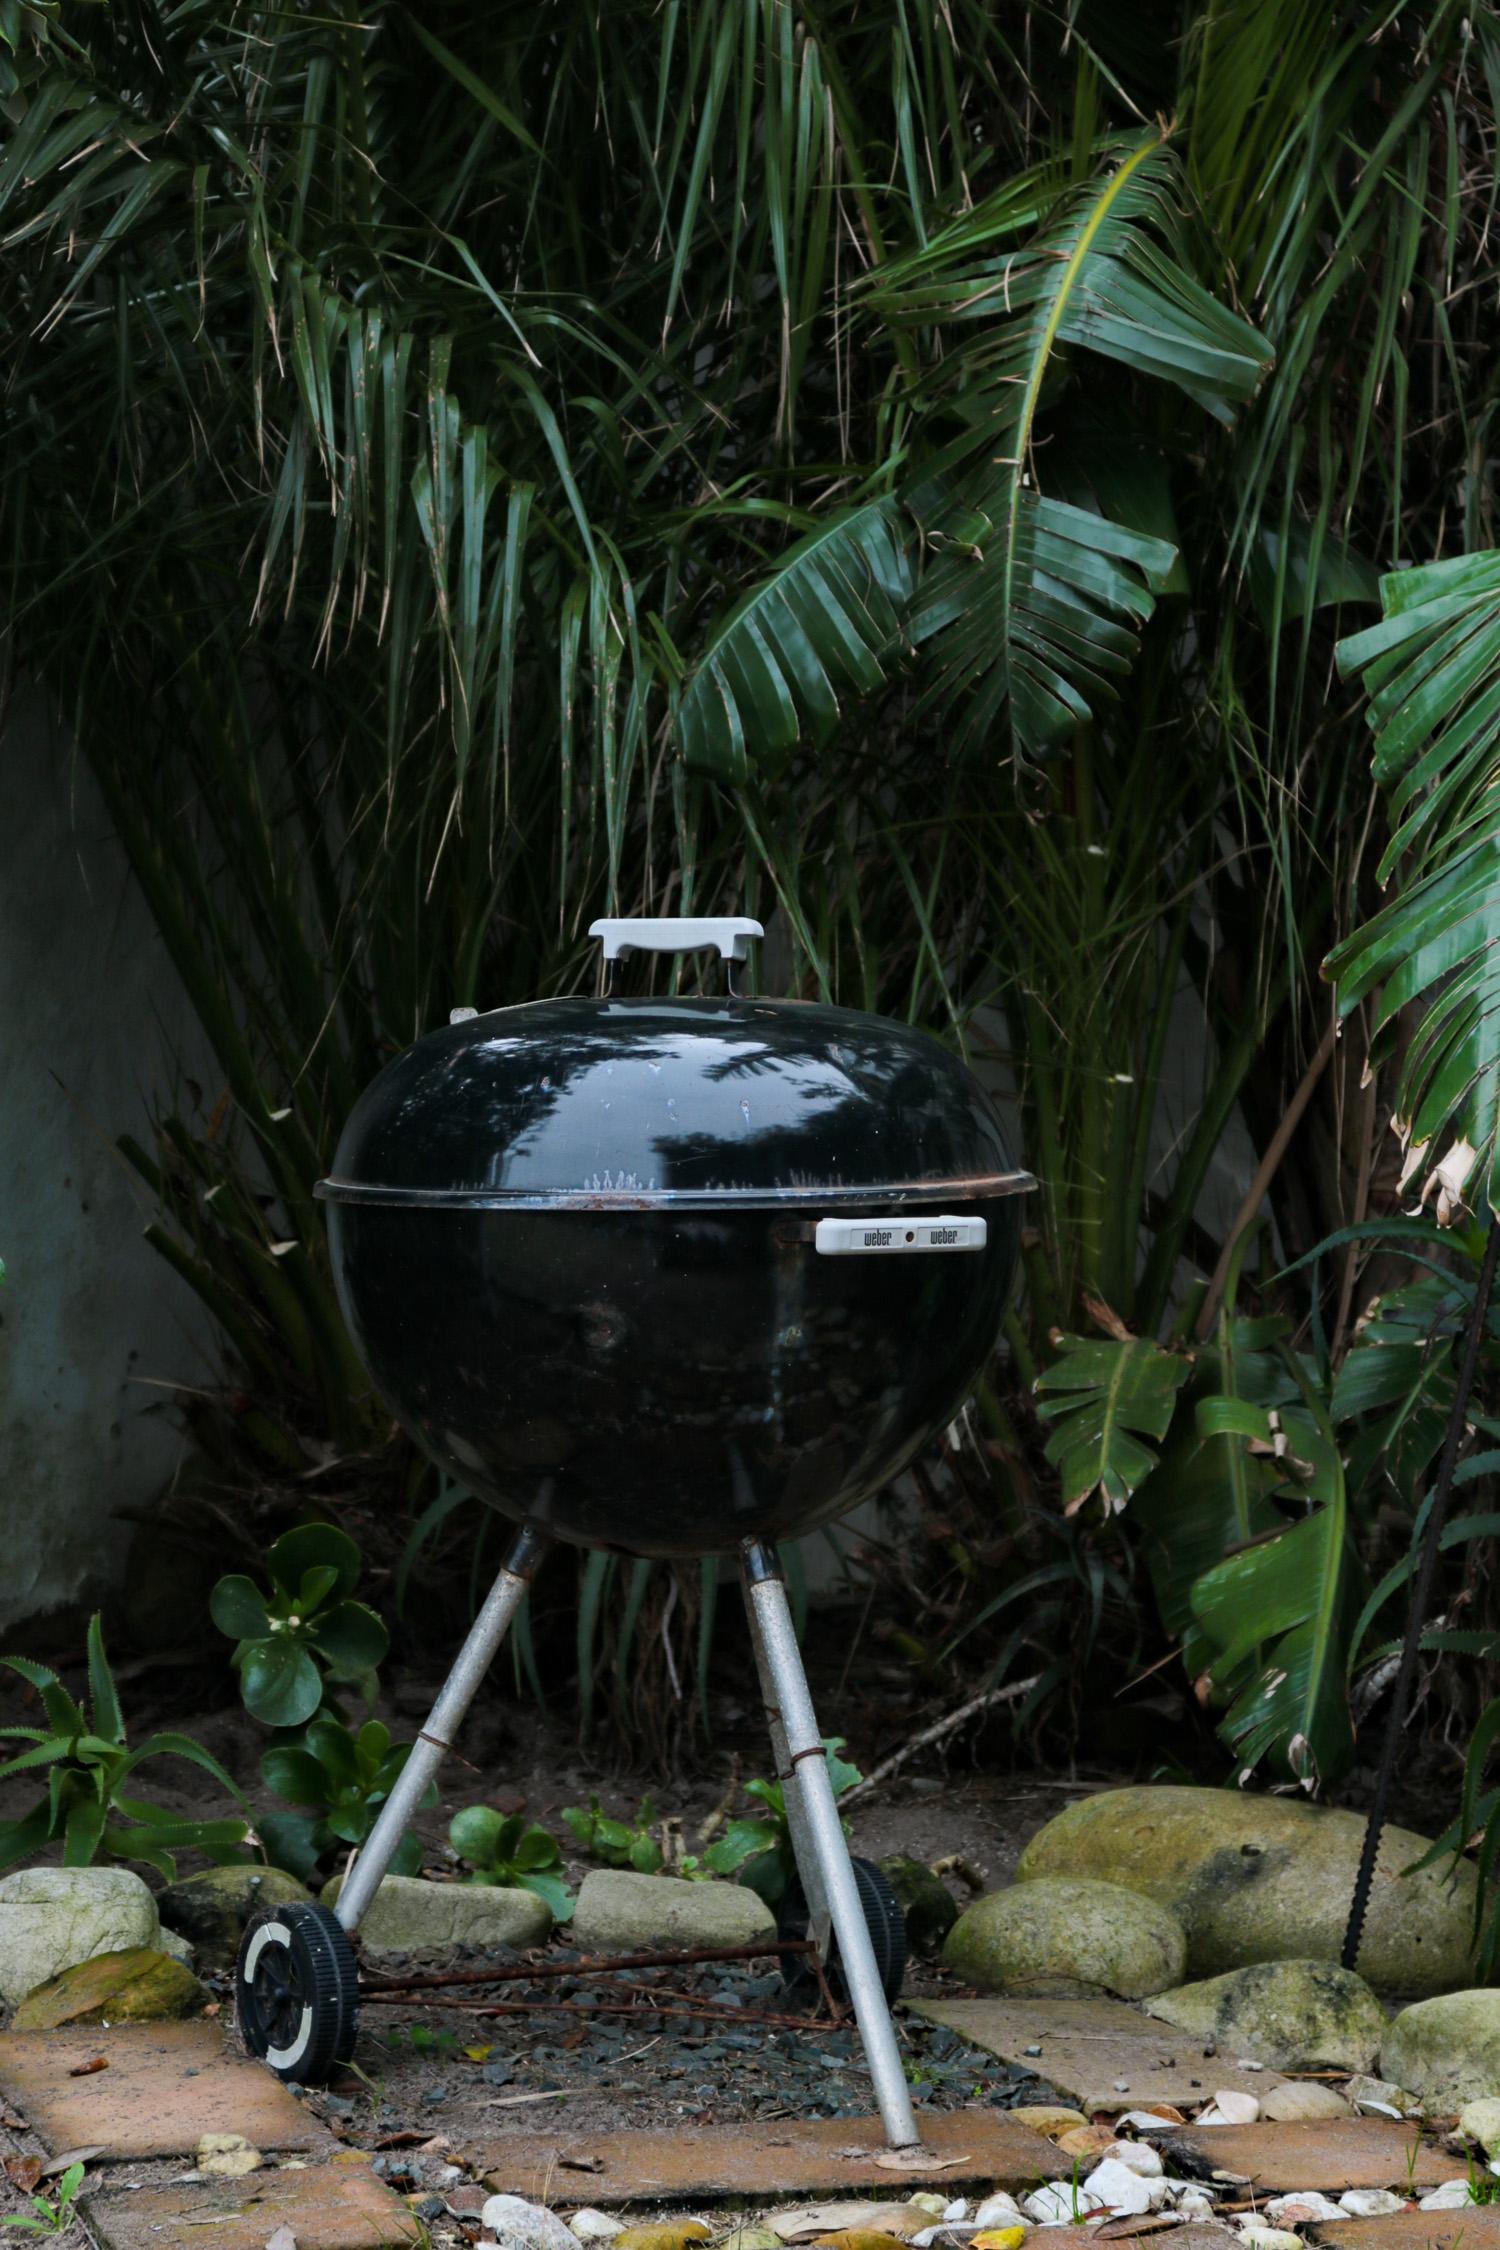 Barbecue / Braai in garden